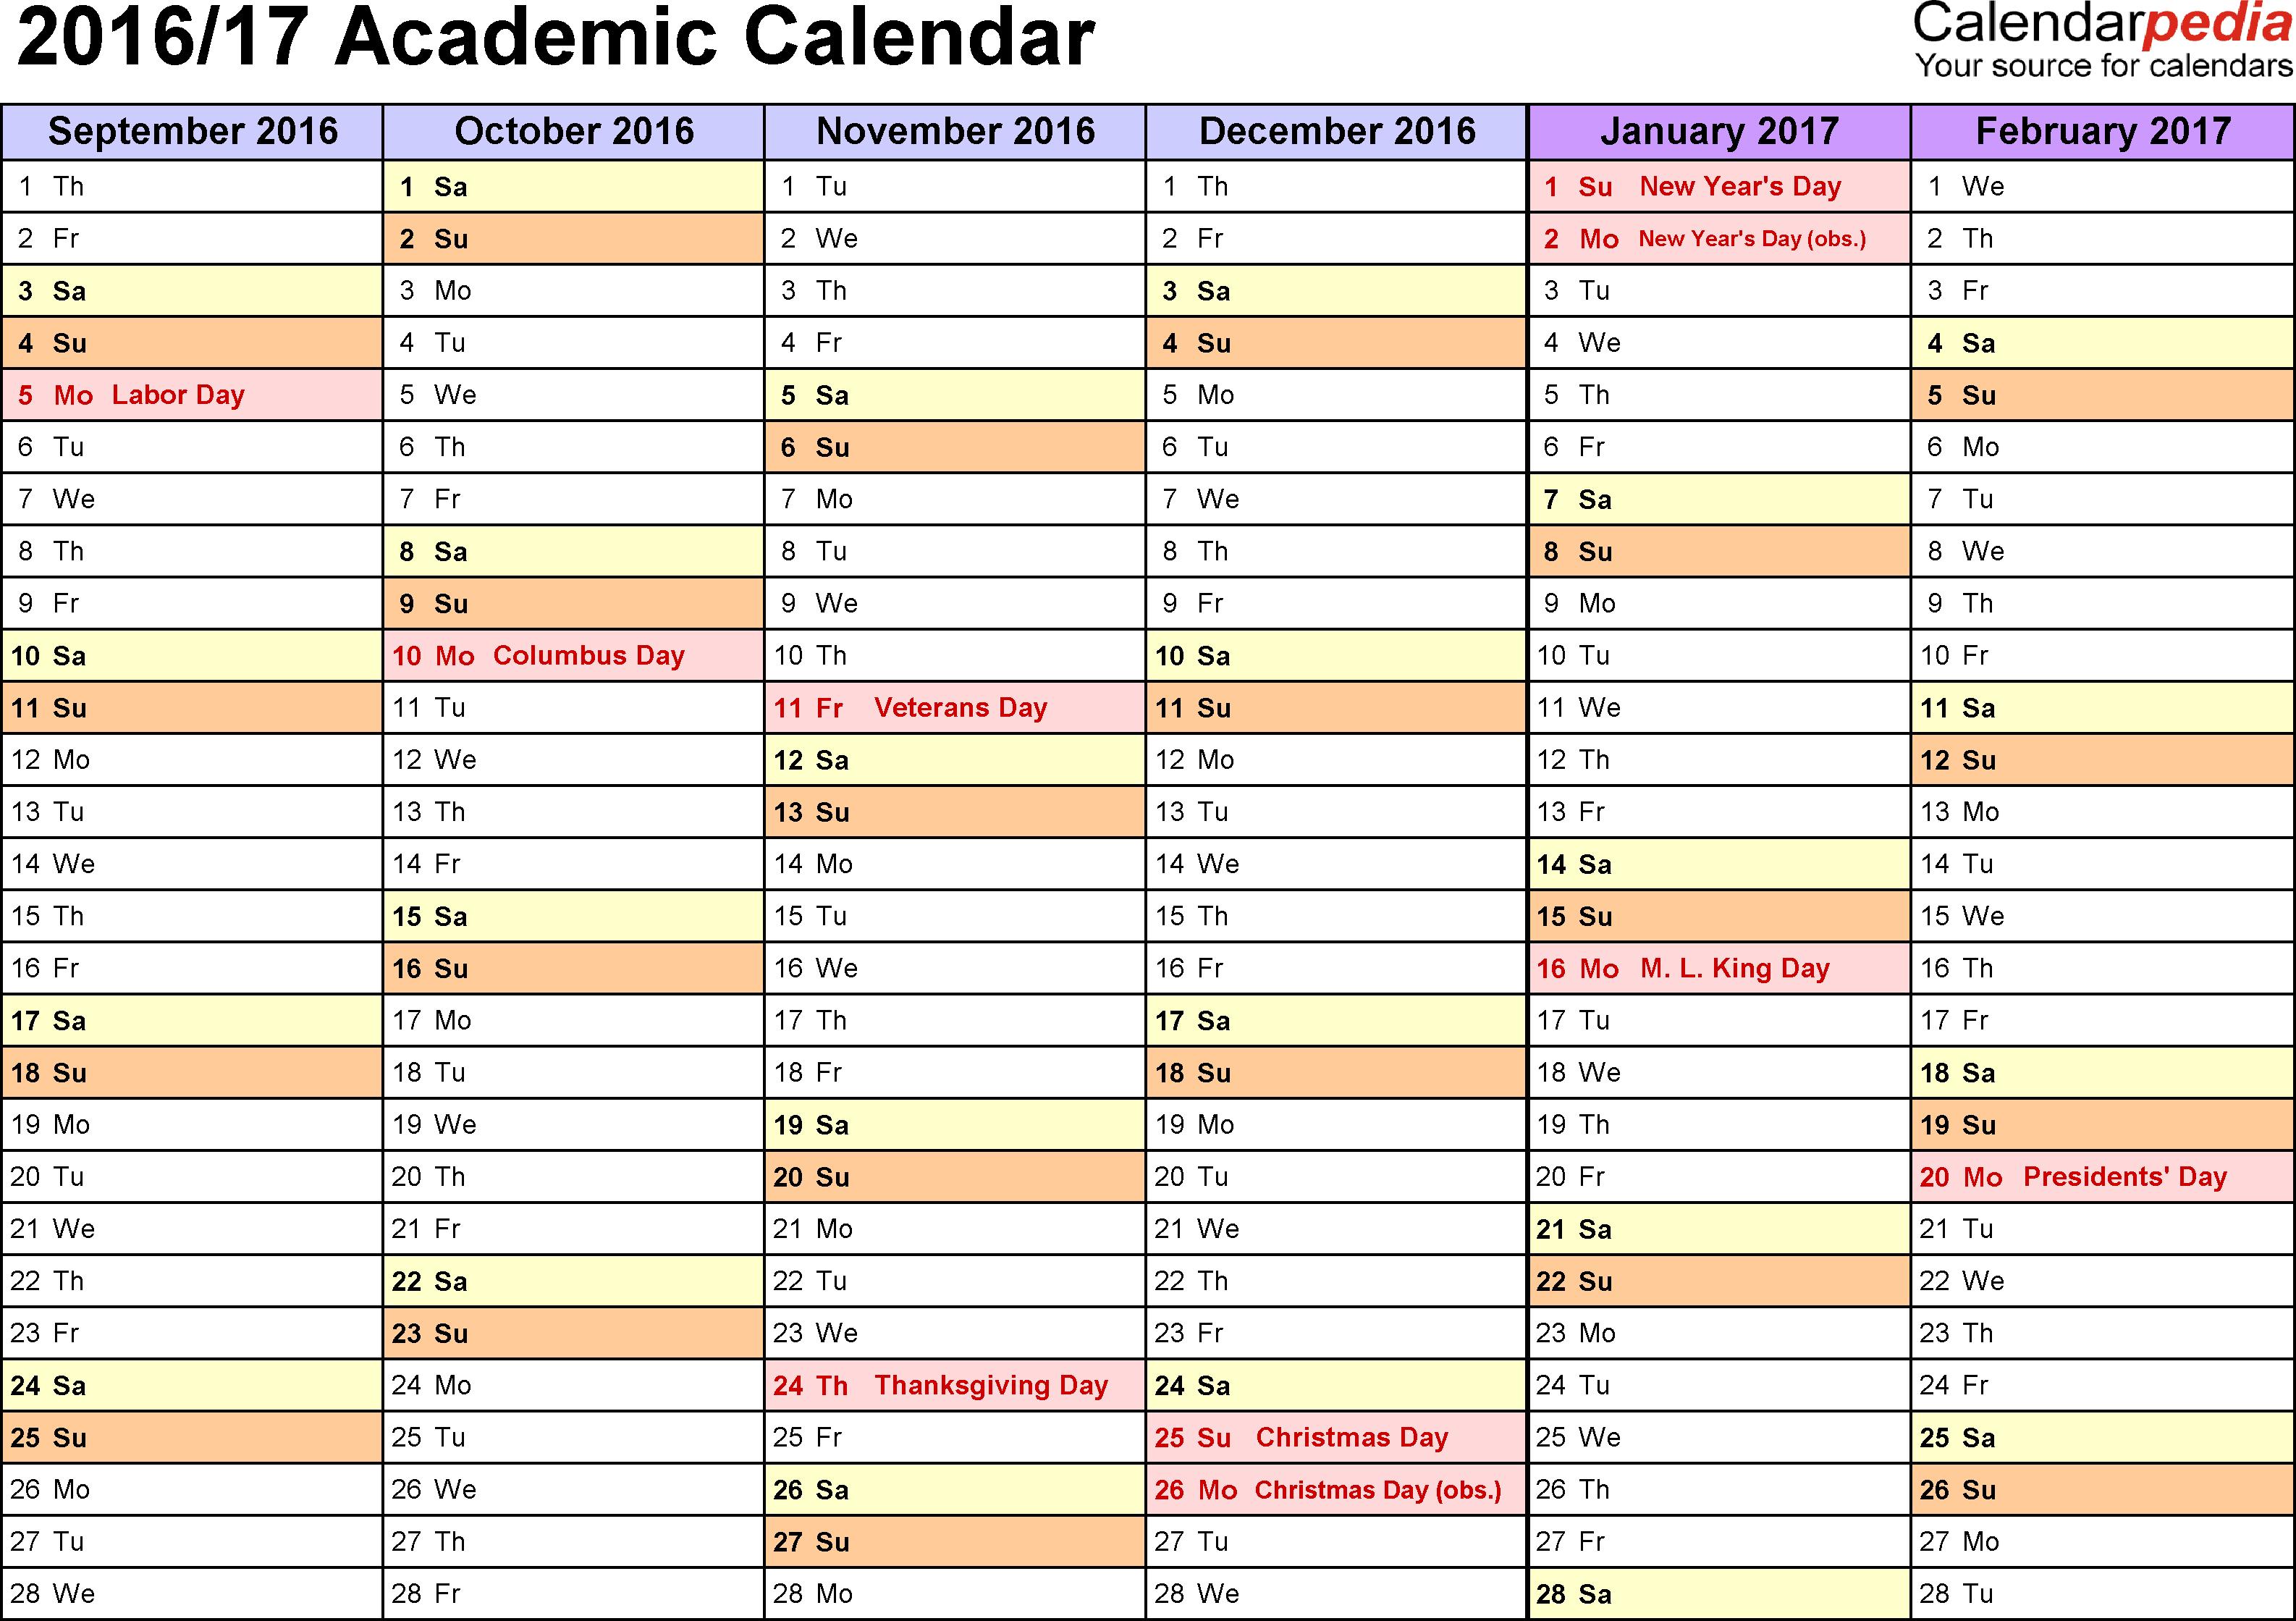 Academic Calendars 2016/2017 - Free Printable Word Templates regarding Template Academic Calendar With Notes